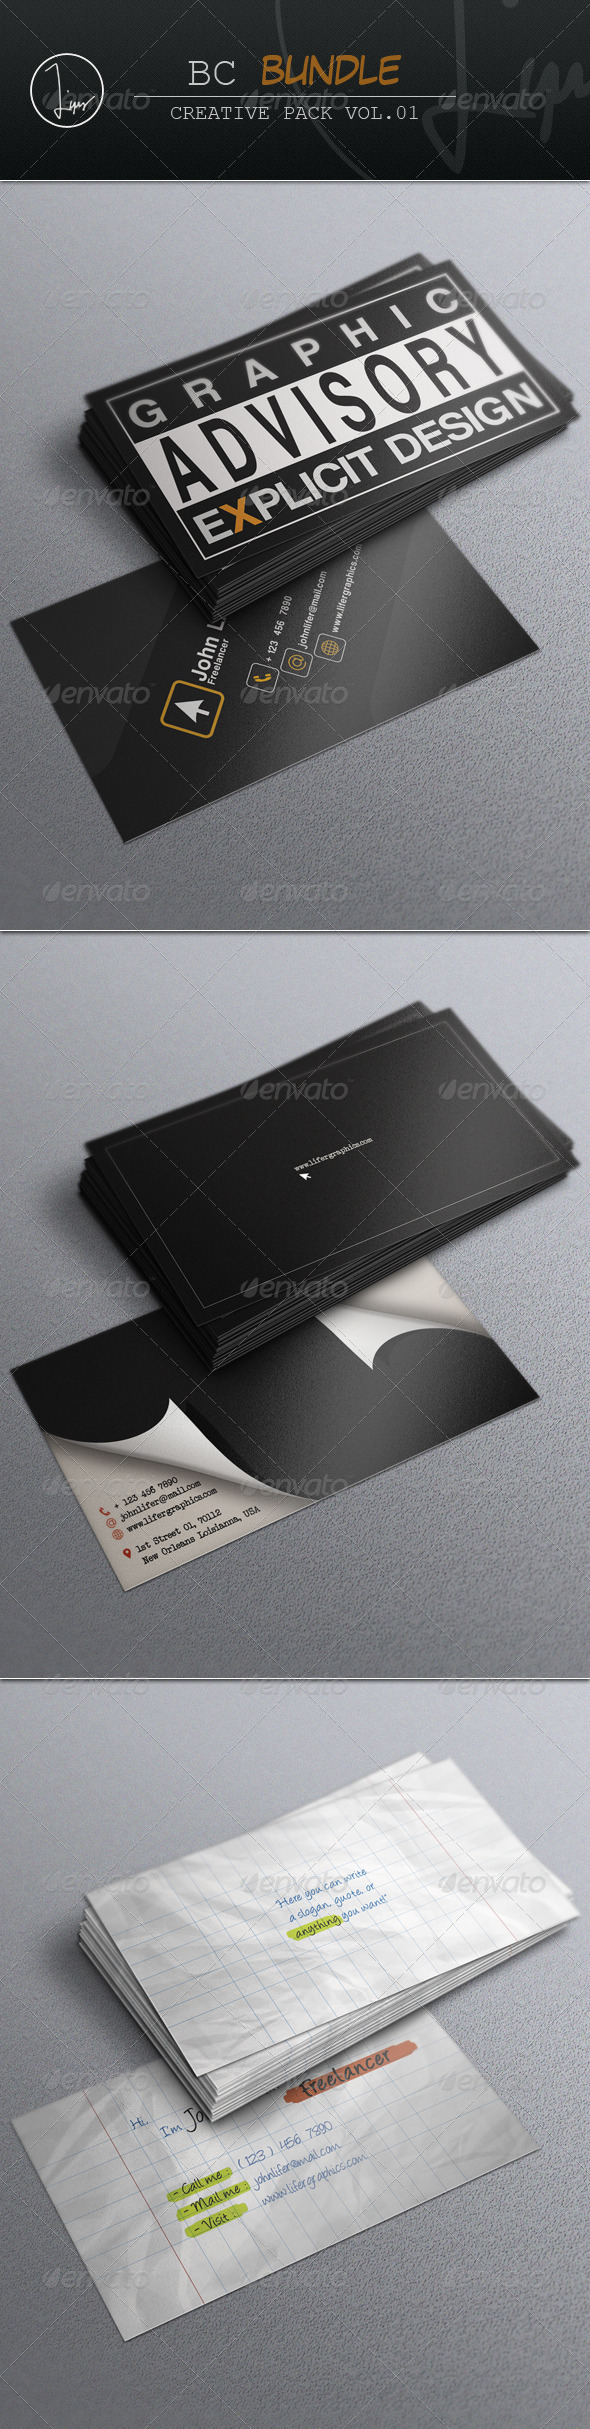 GraphicRiver Business Card Bundle Vol.01 7264345